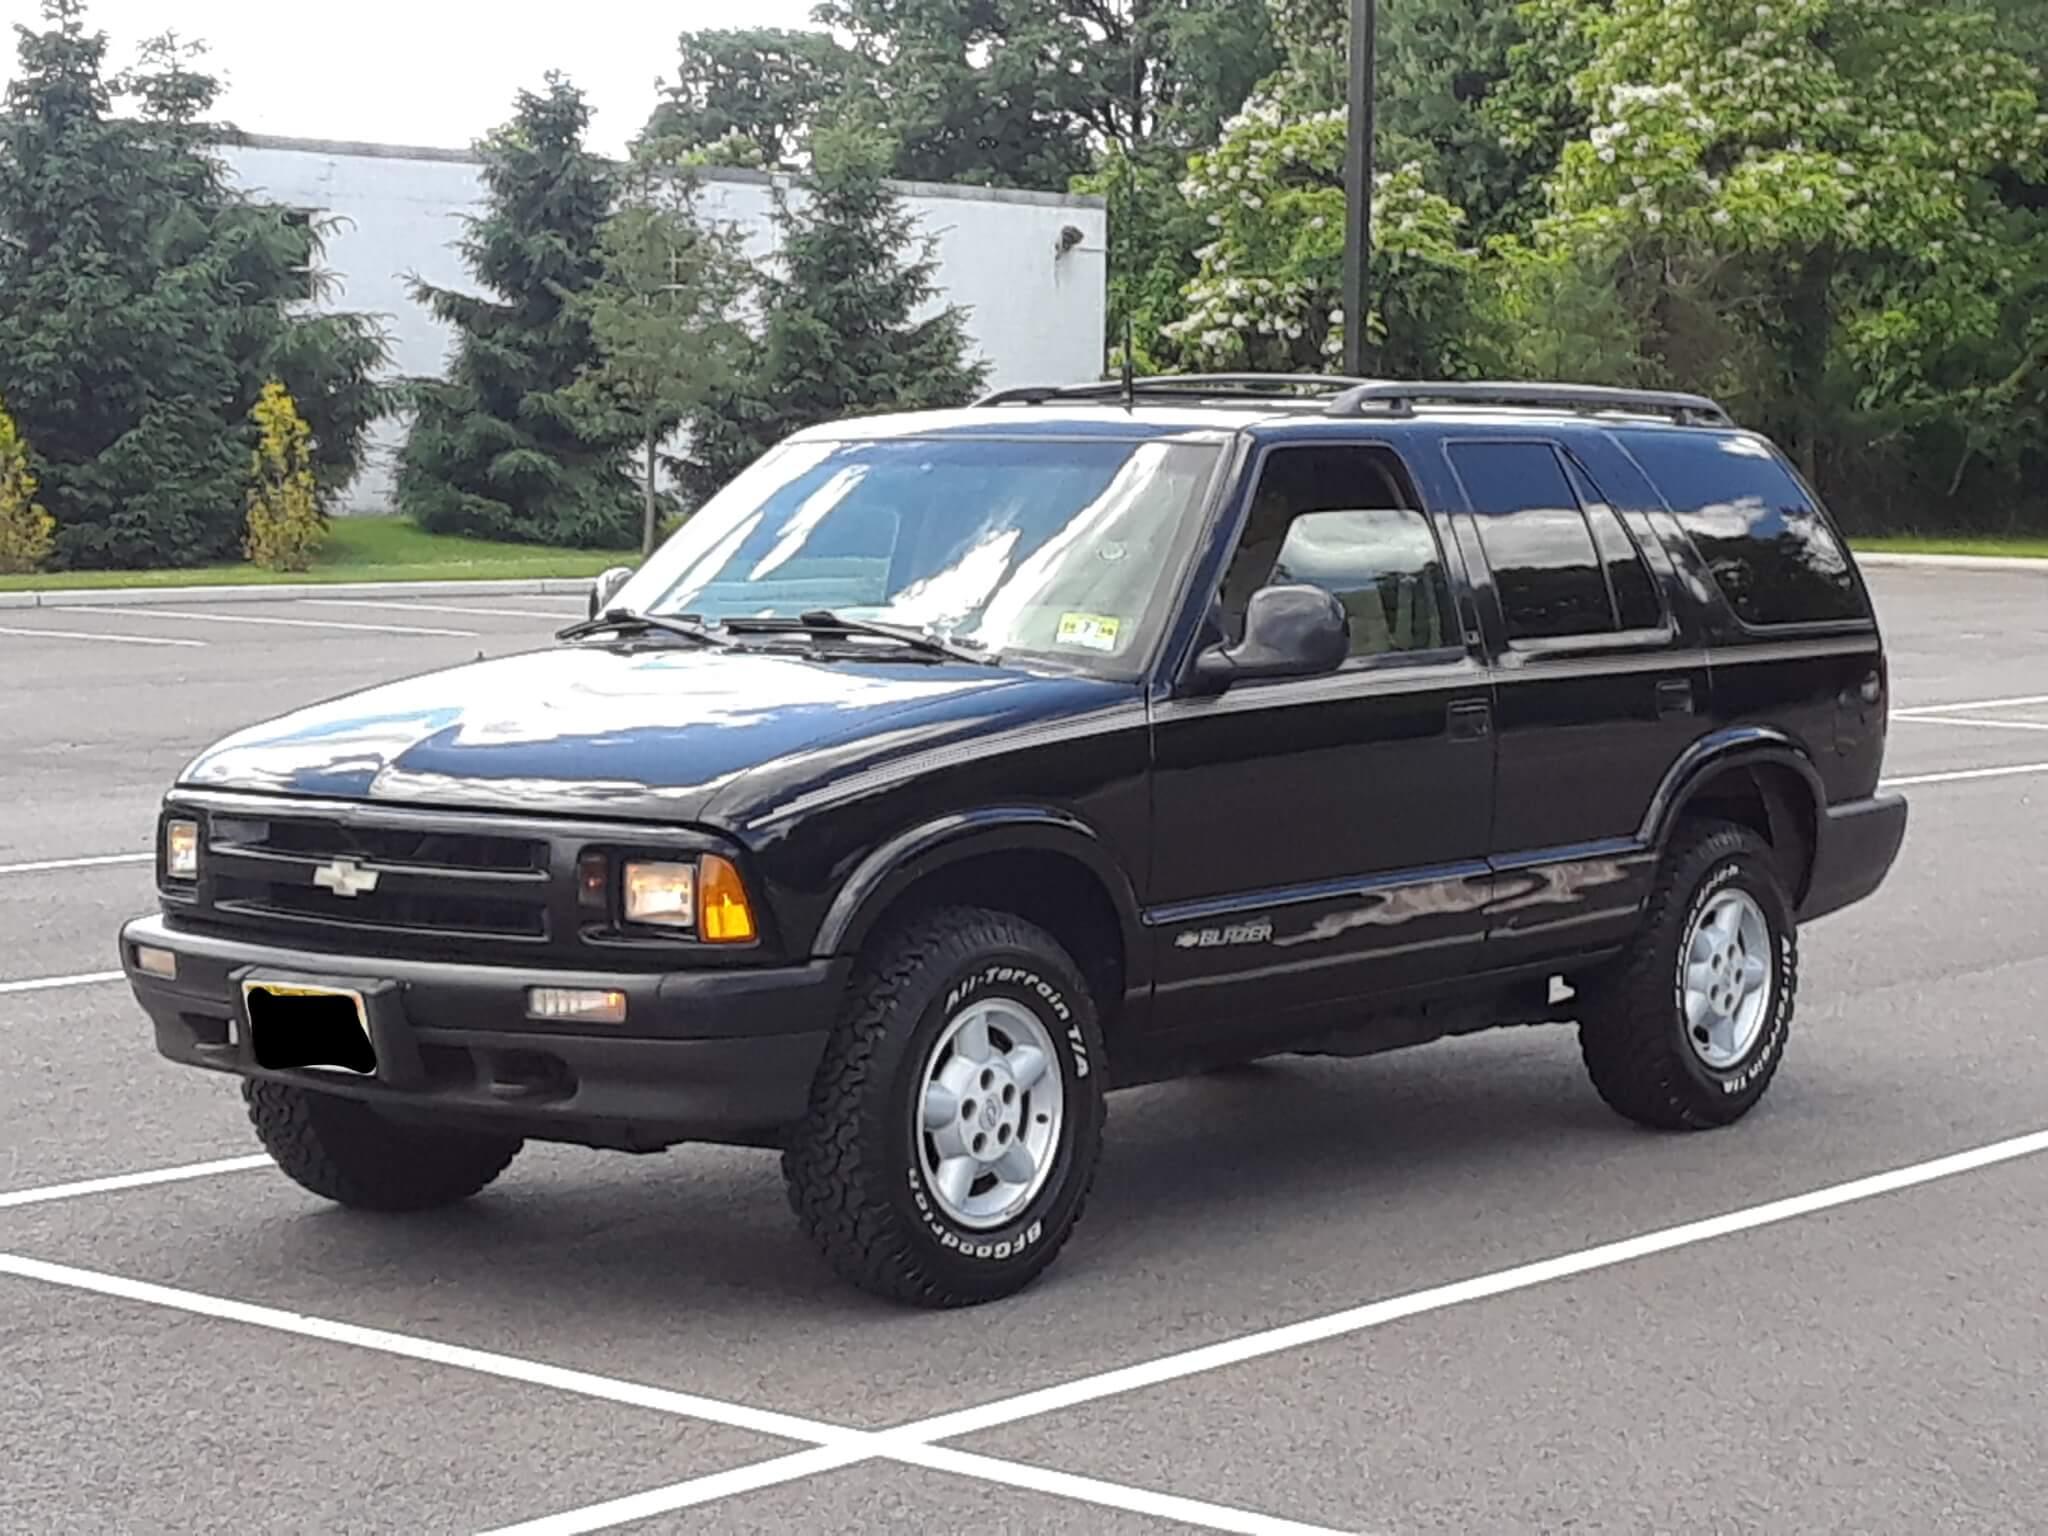 1996 chevy s10 blazer louis c lmc truck life 1996 chevy s10 blazer louis c lmc